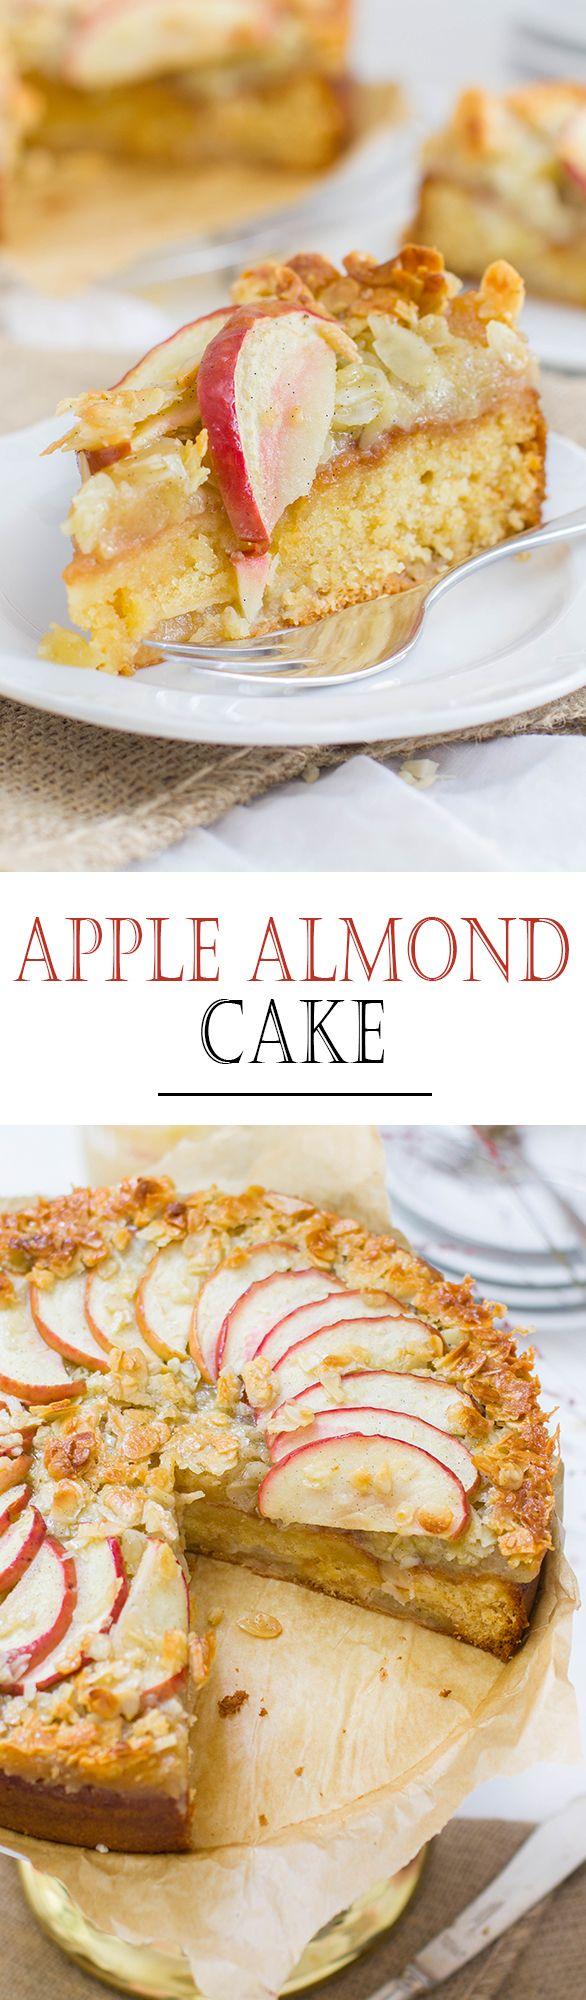 Juicy Apple Almond Cake with Caramel Crust and Apple Sauce | Saftiger Apfel Mandel Kuchen mit Karamellkruste und Apfelkompott